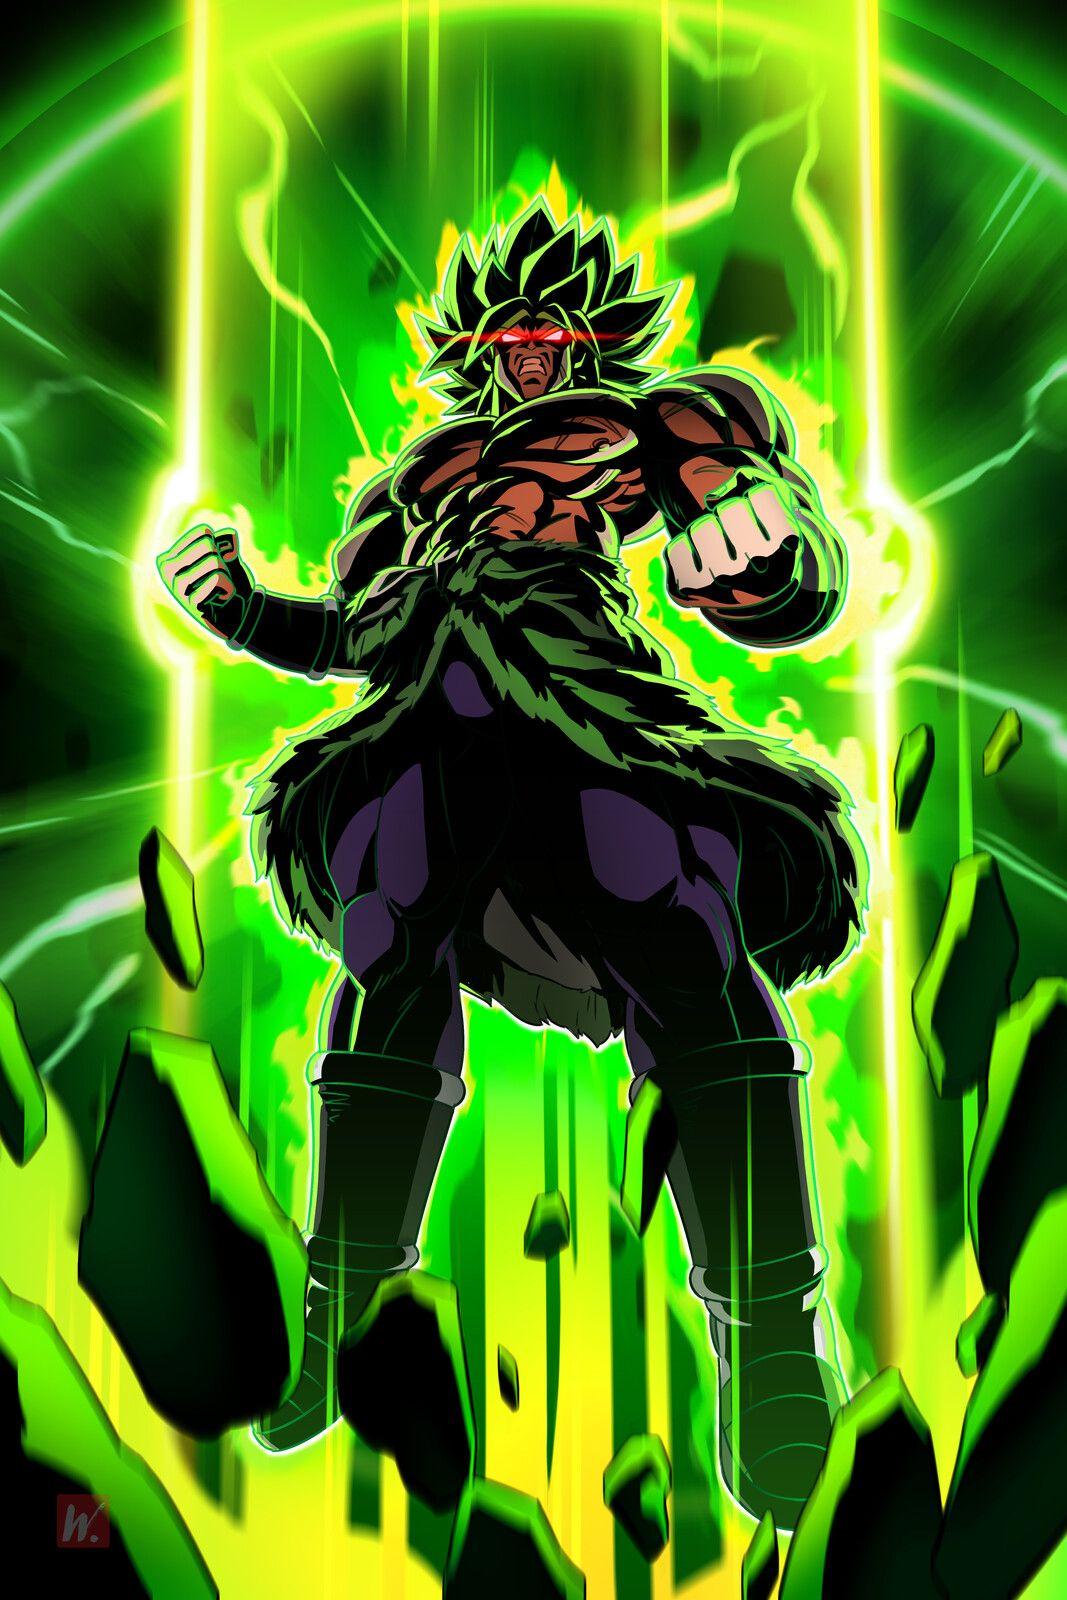 Broly Super Saiyajin Legendario Dbz Balle De Dragon